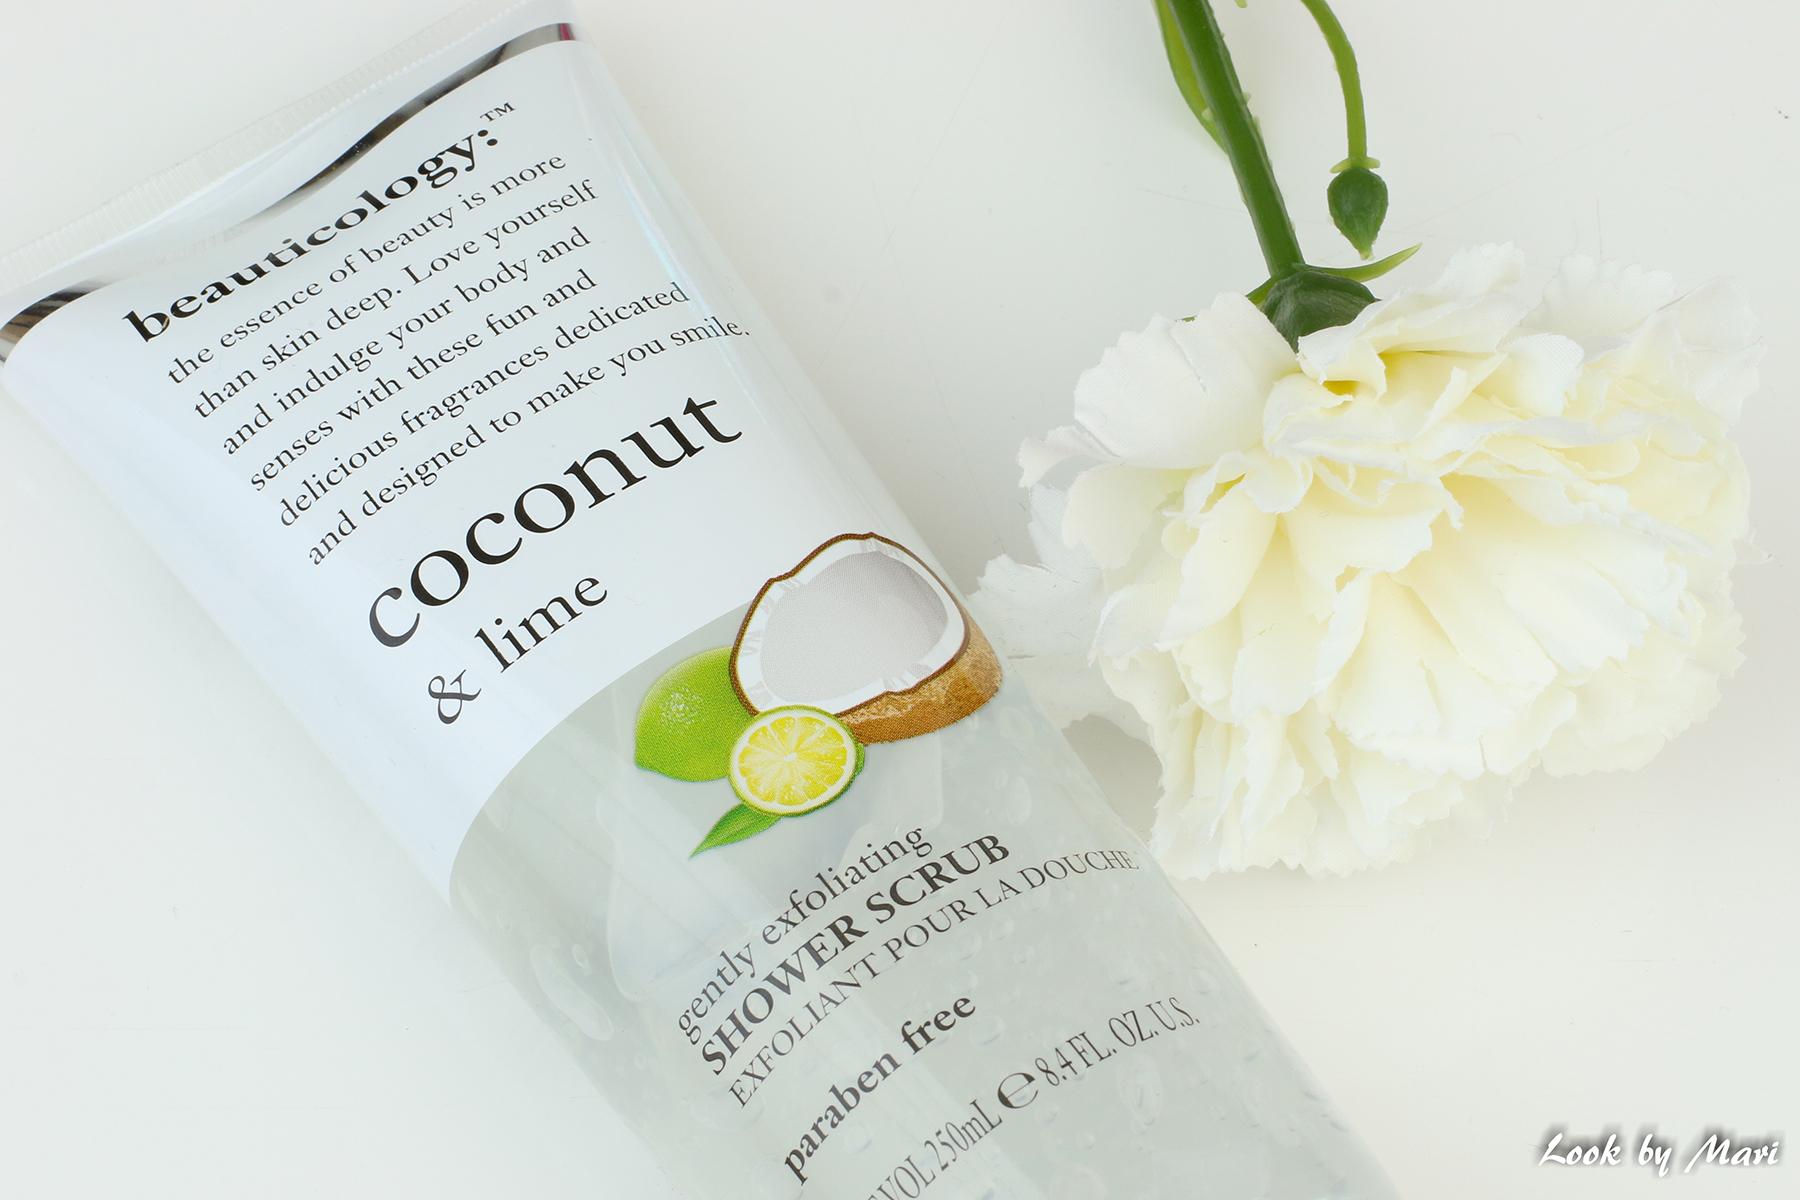 17 beauticolony coconut & lime shower scrub vartalonkuorinta kokemuksia tuoksu oletkaunis.fi